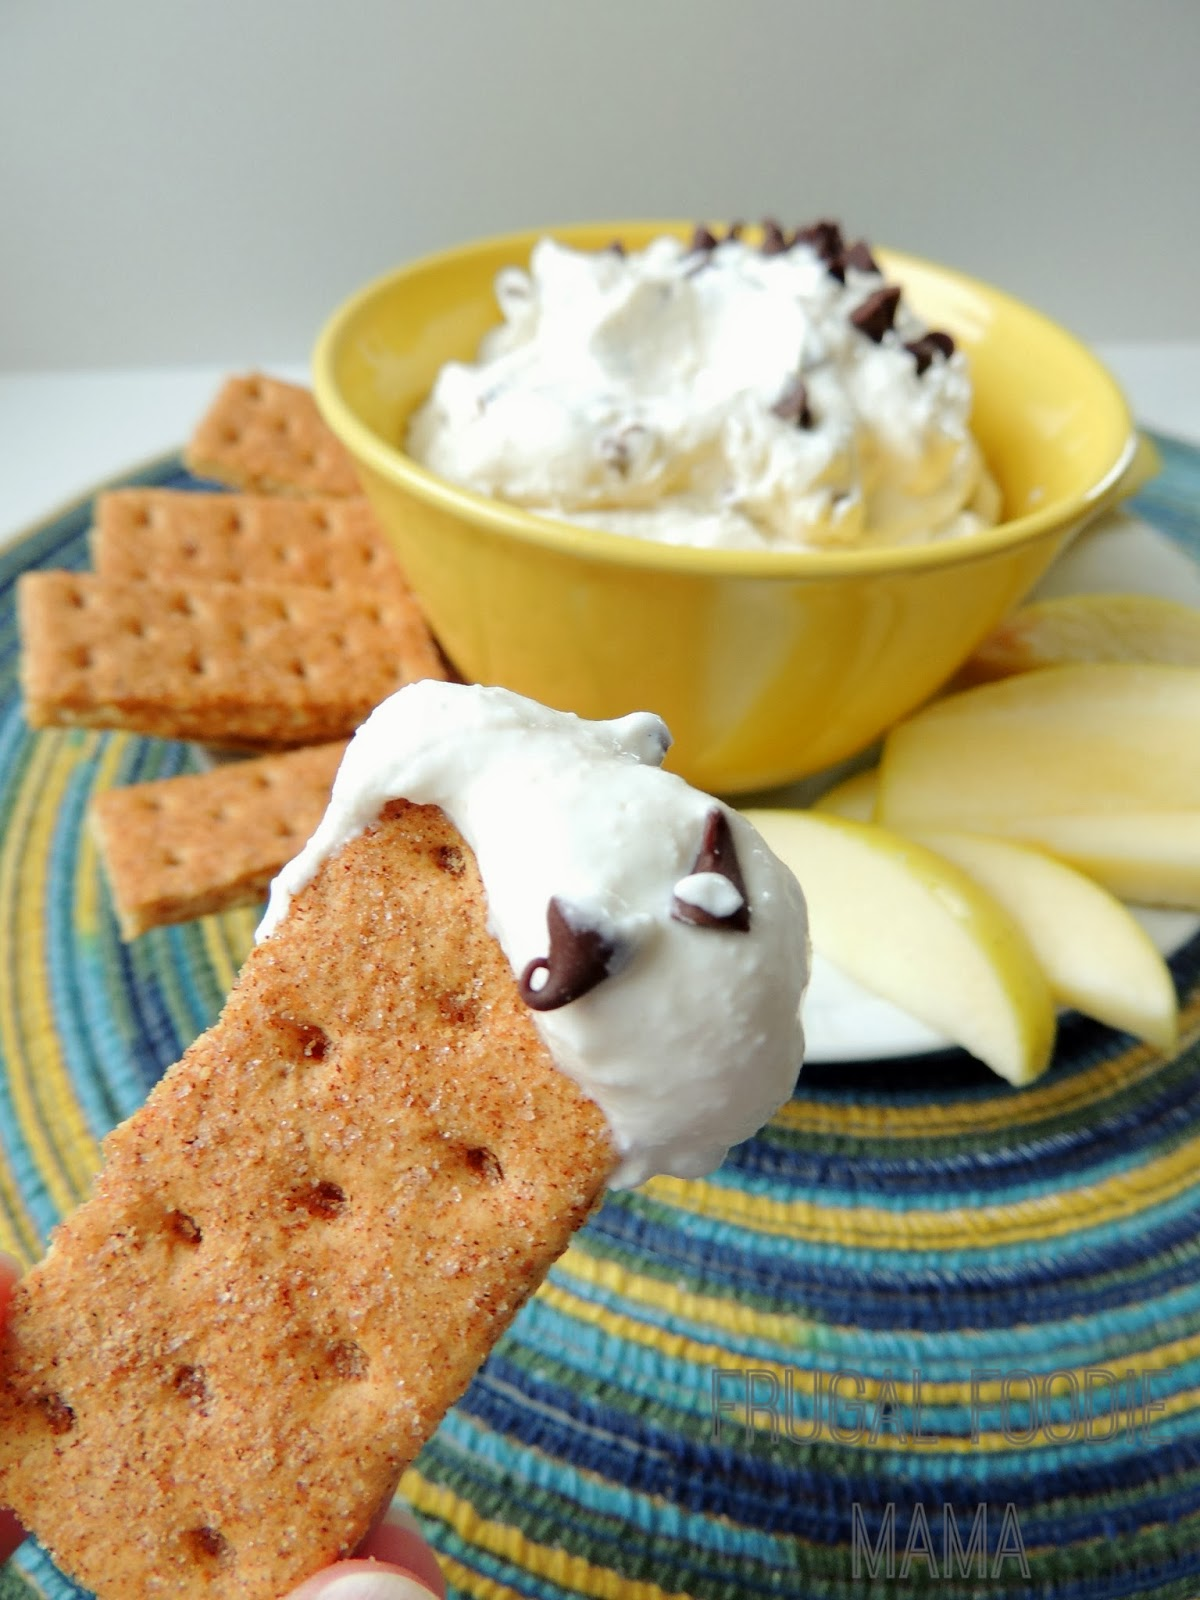 Frugal Foodie Mama: Skinny Chocolate Chip Cannoli Dip